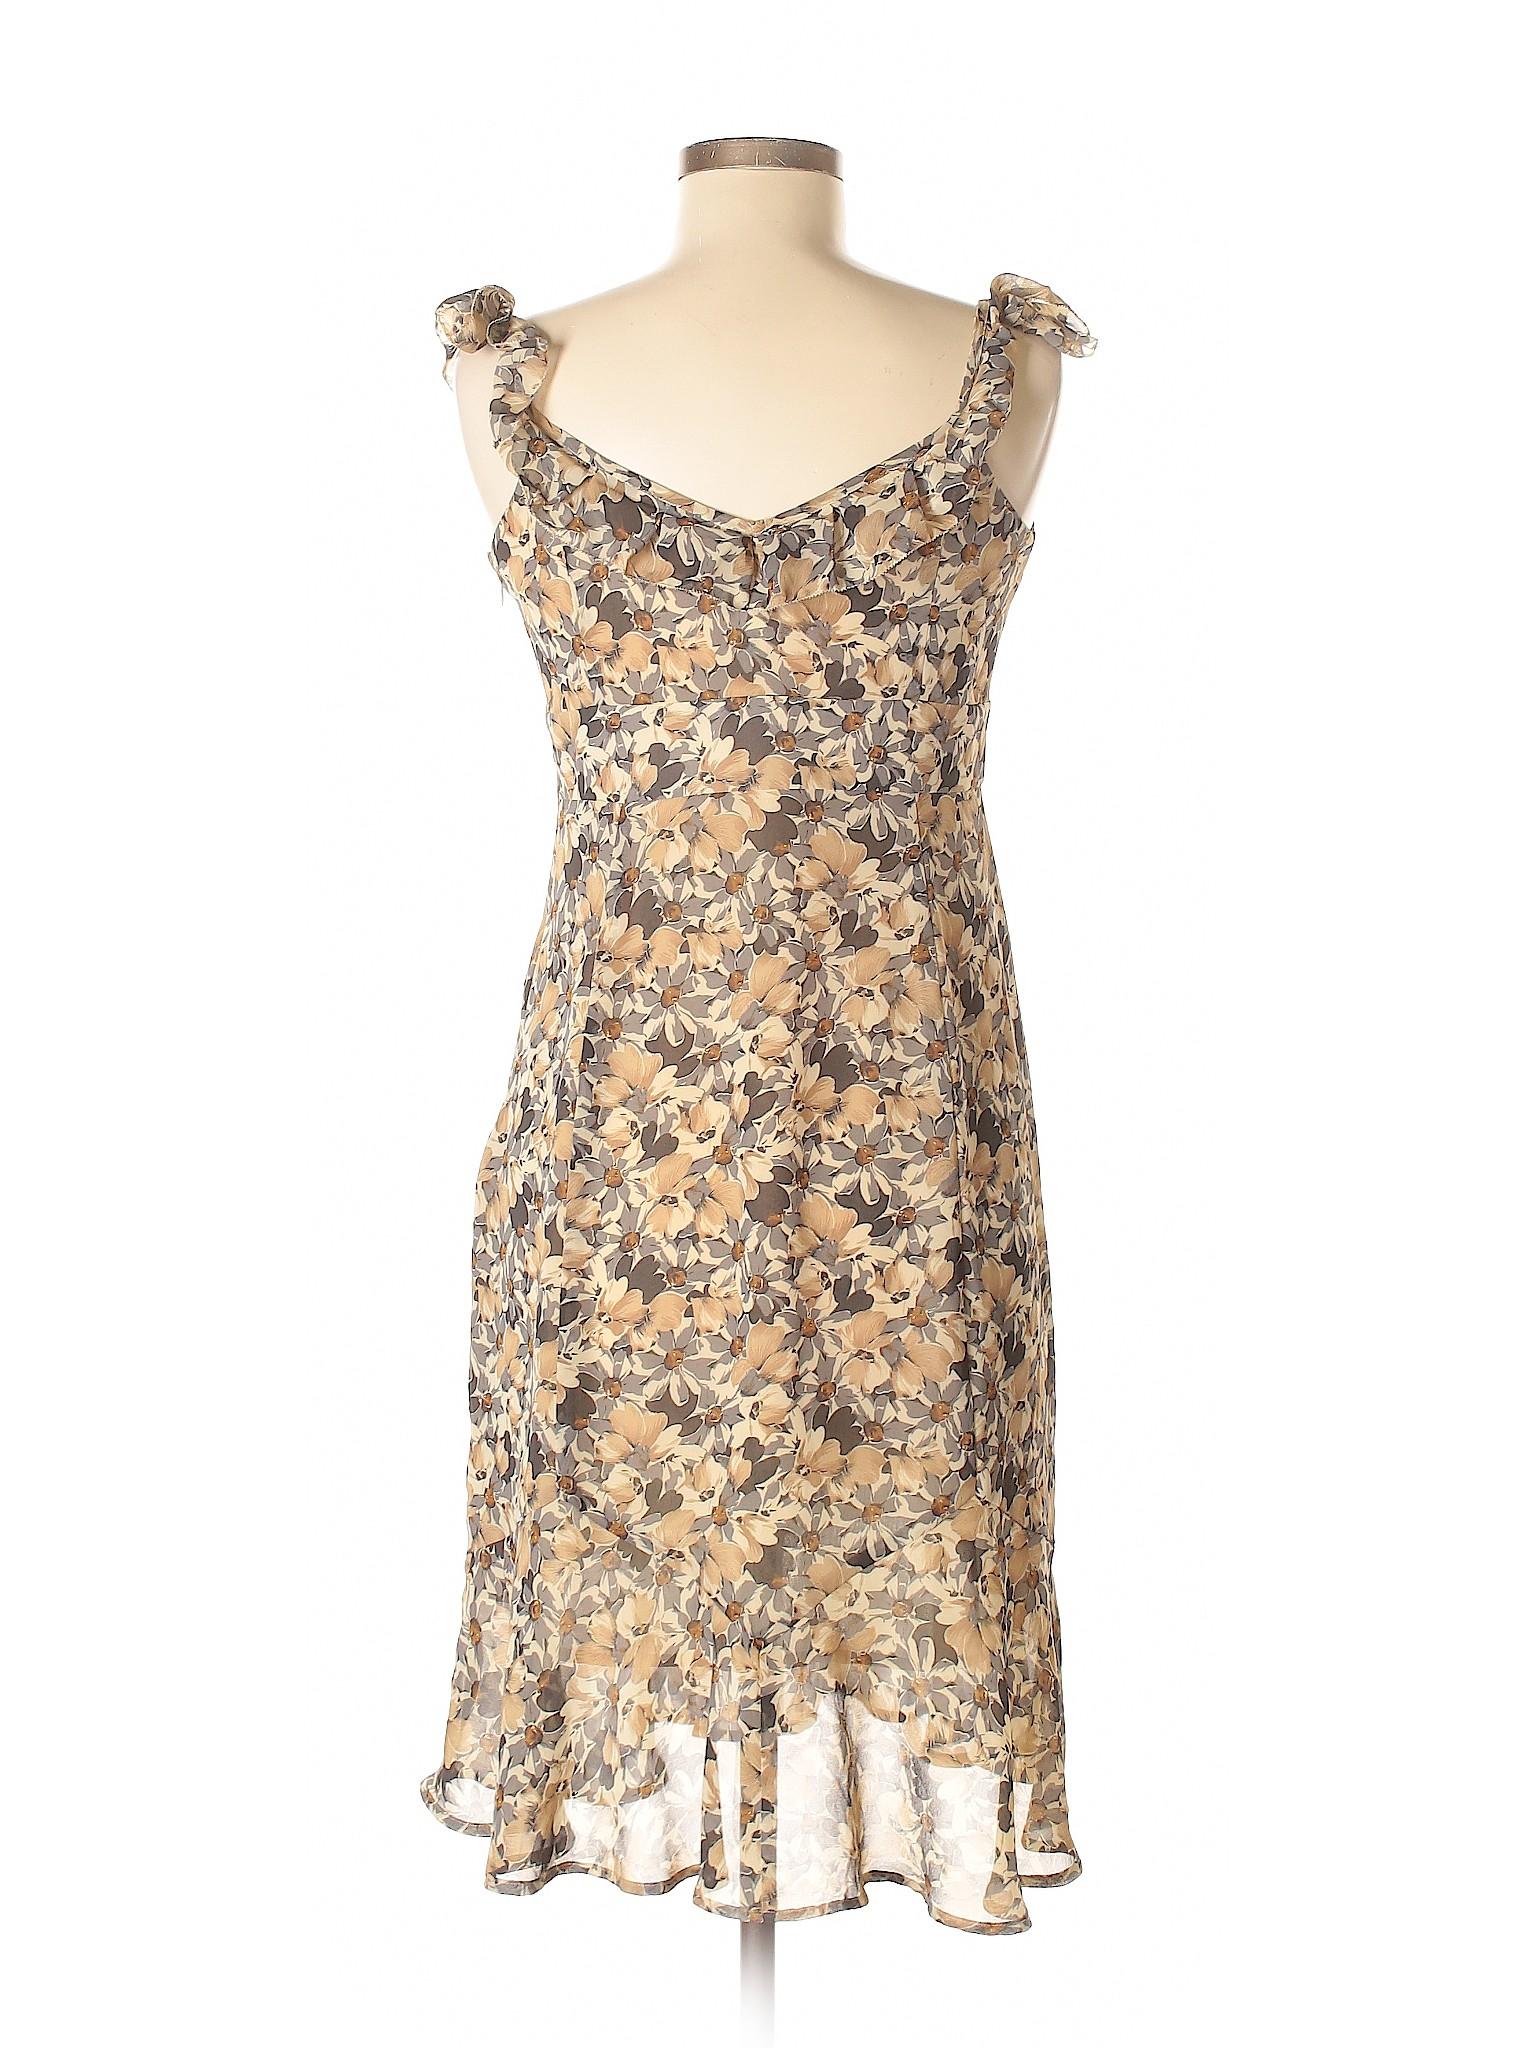 winter Dress LOFT Casual Taylor Boutique Ann BUdxq